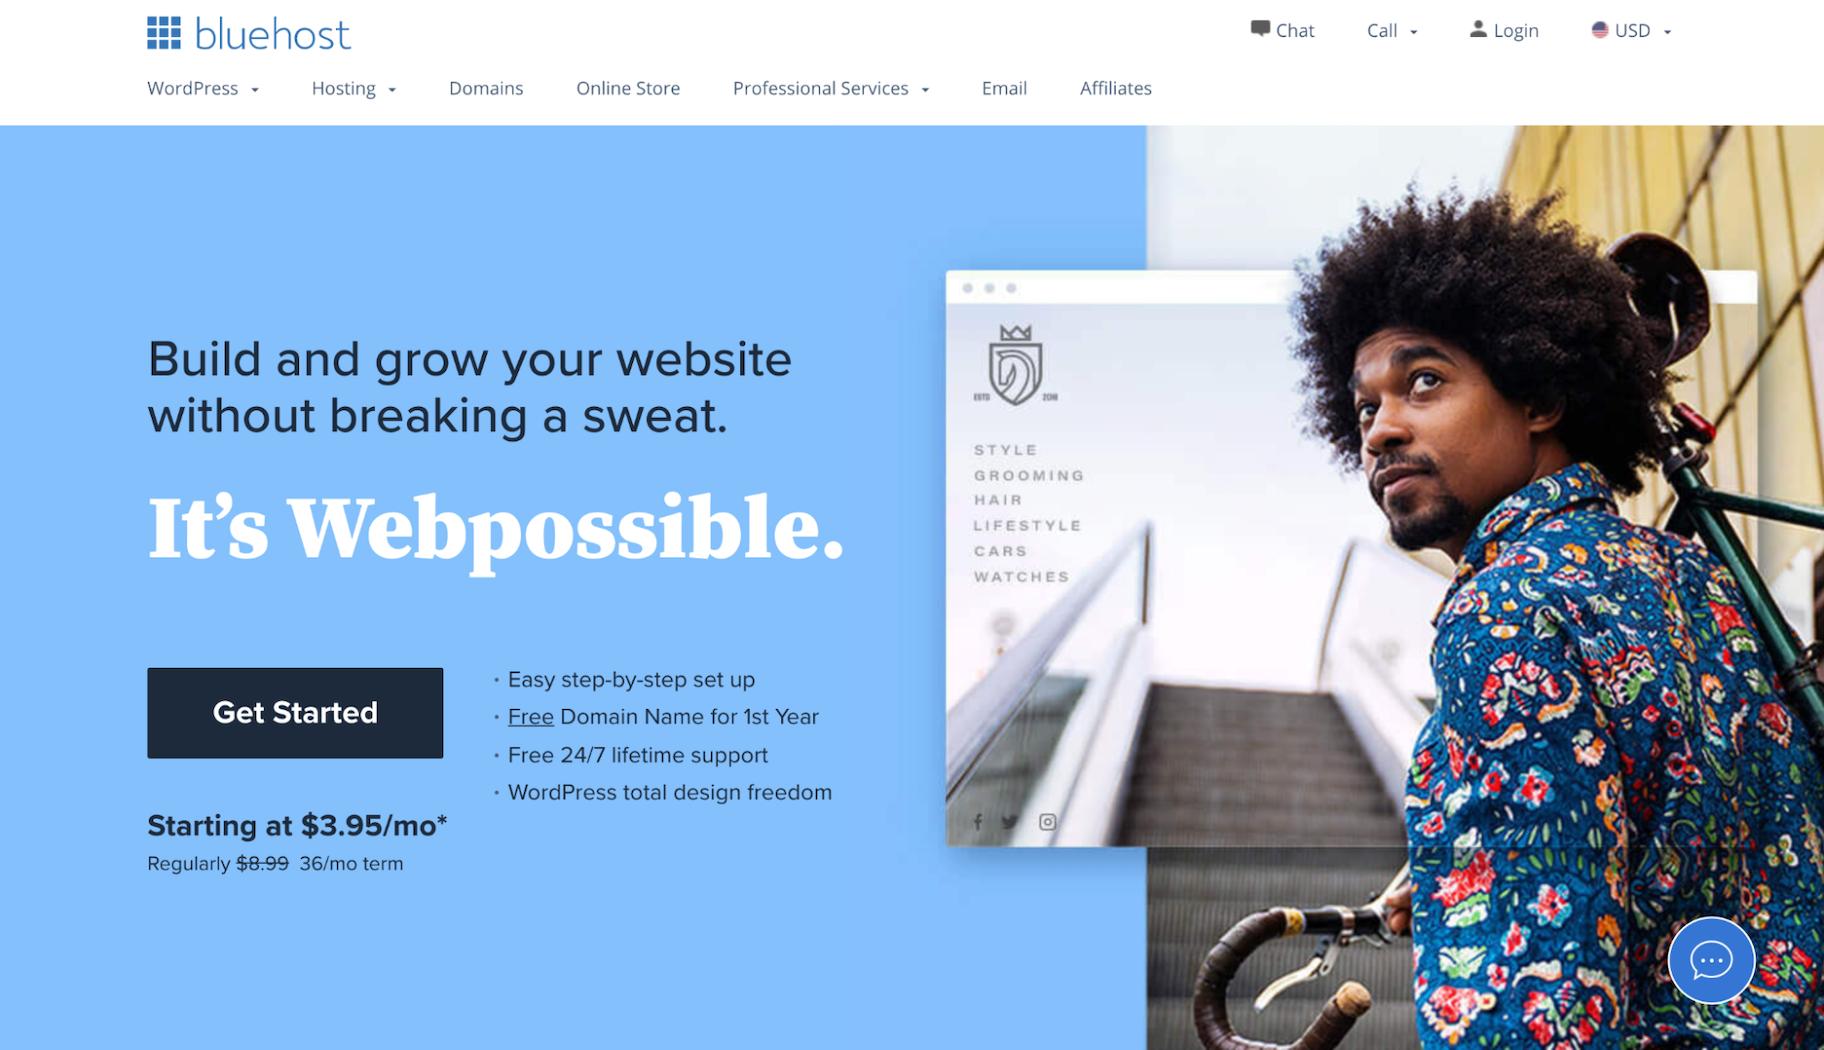 Other Companies Like GoDaddy: Bluehost